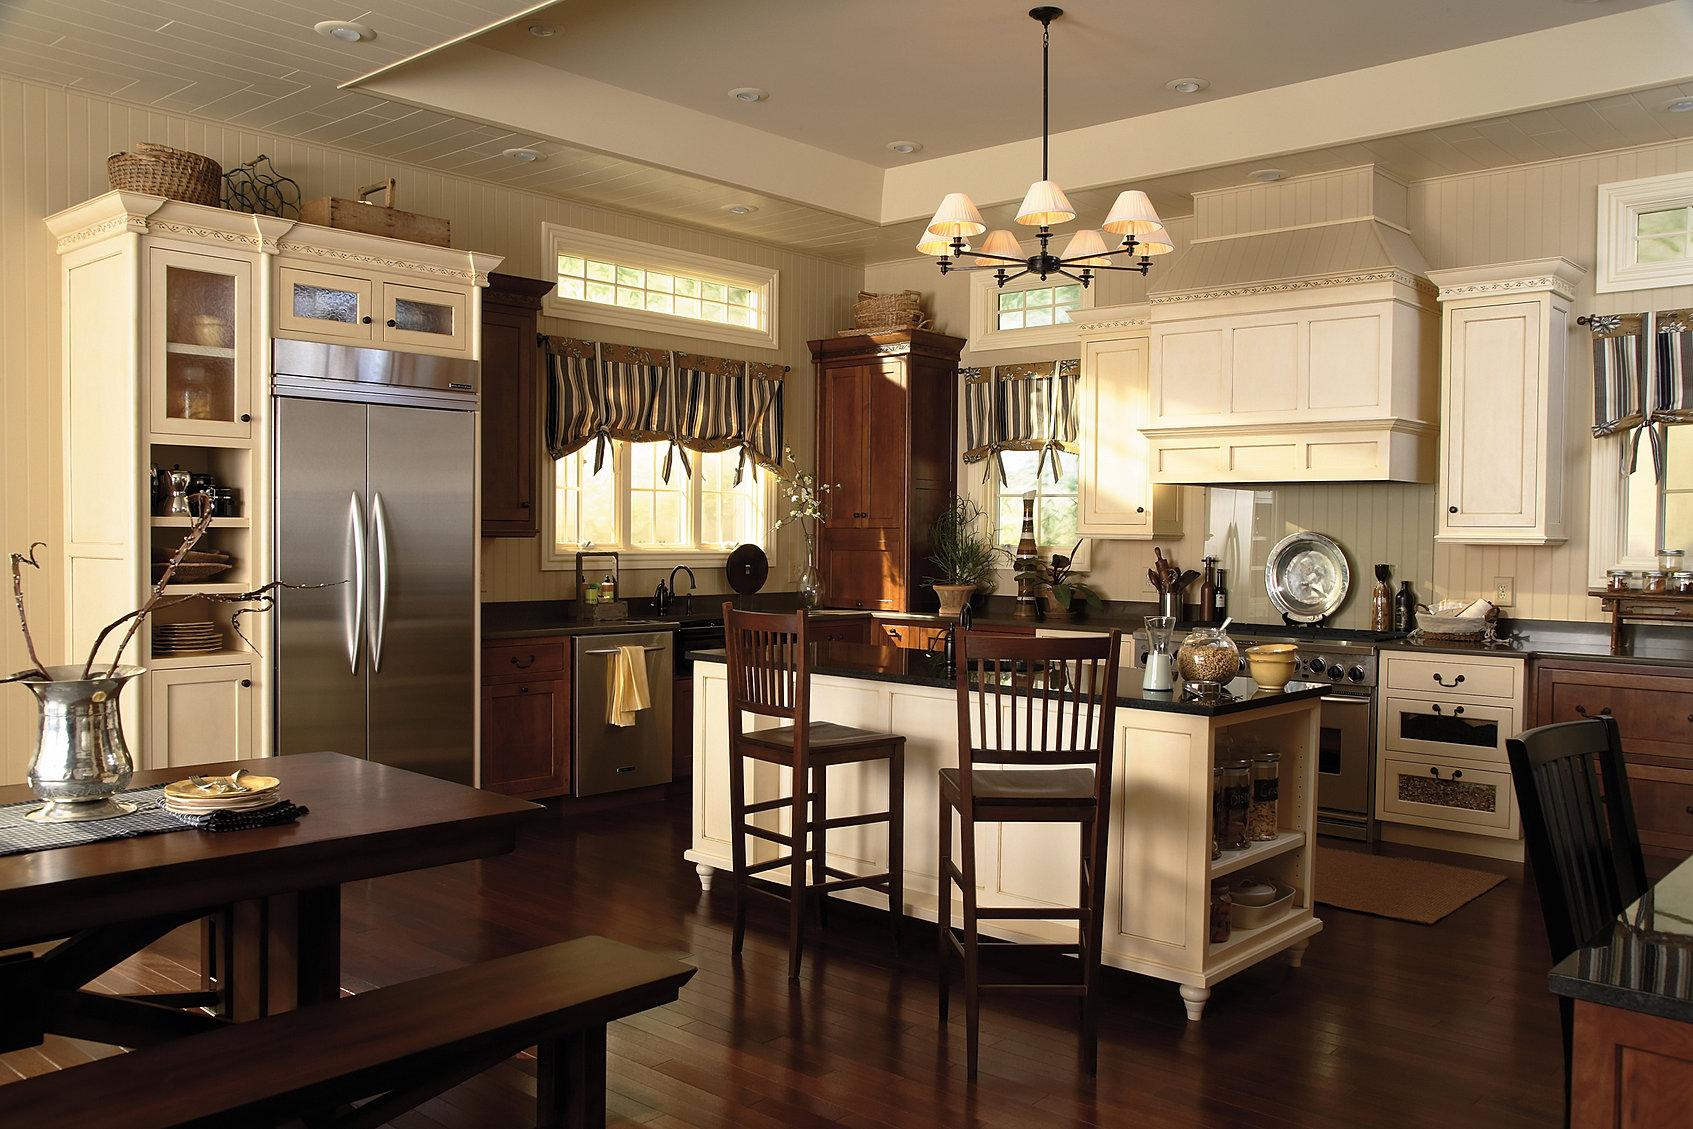 Kitchen bath design gallery orange nj - Aspen Cabinet